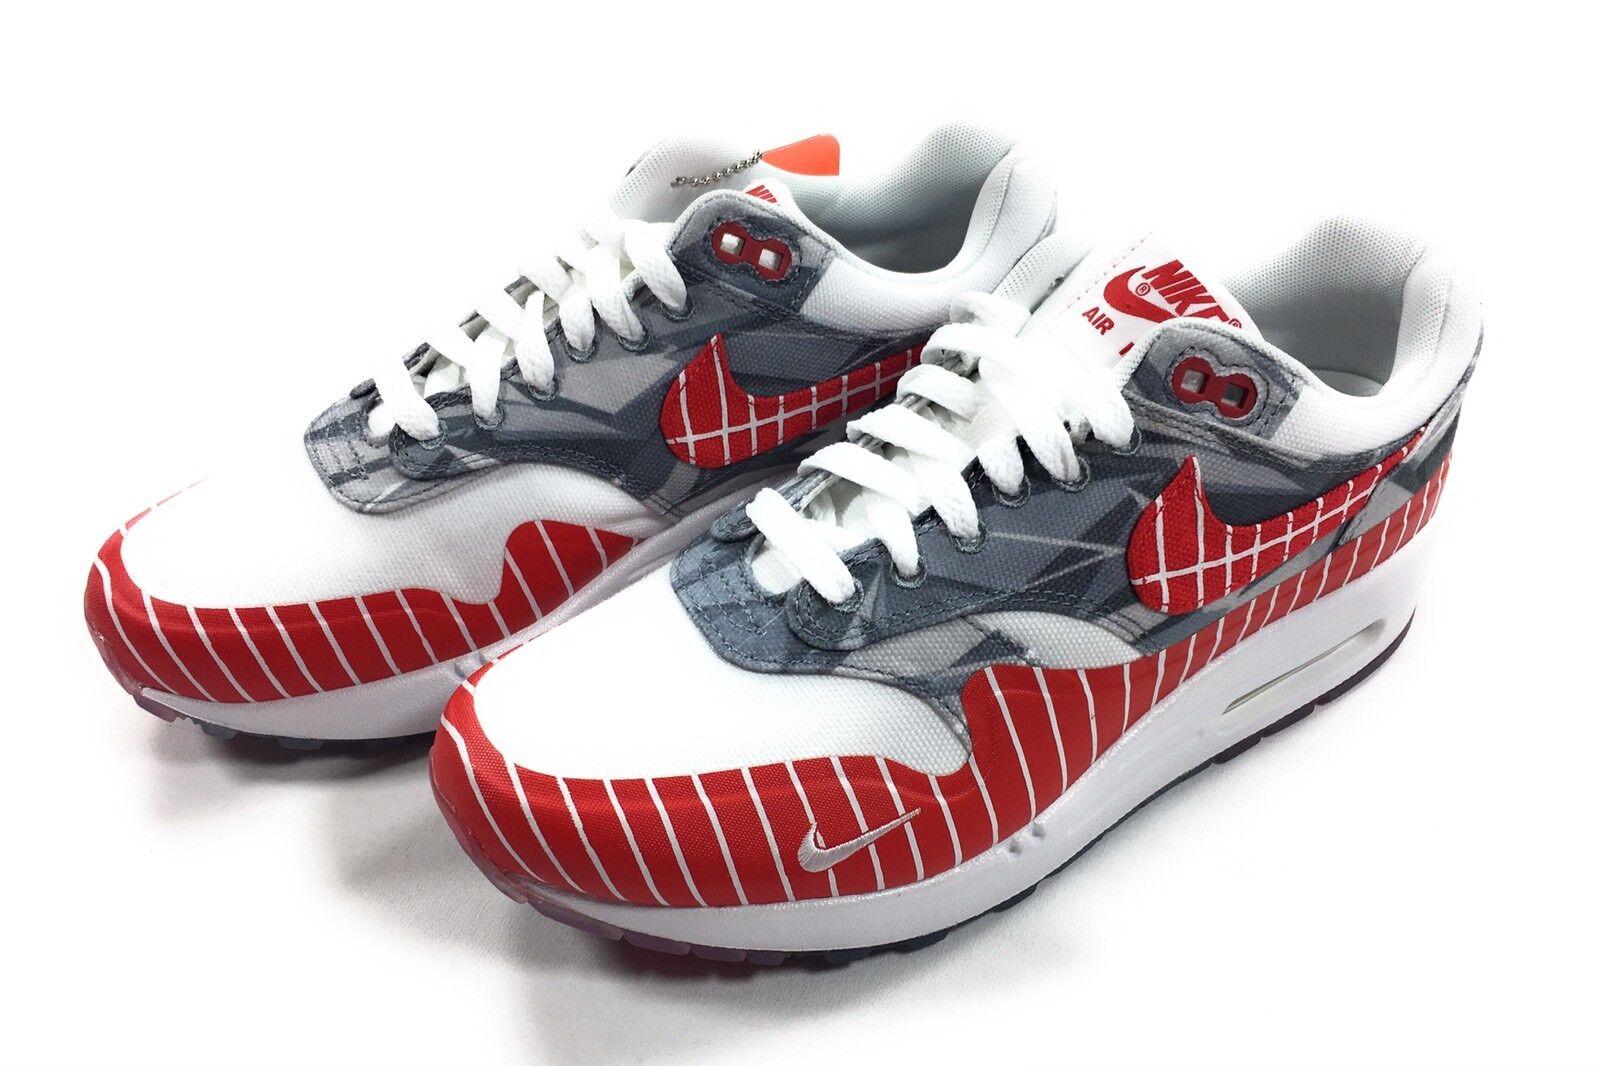 Nike Air Max 1 Los Primeros Latino Heritage Month Weiß rot herren 6.5 AH7740 -100